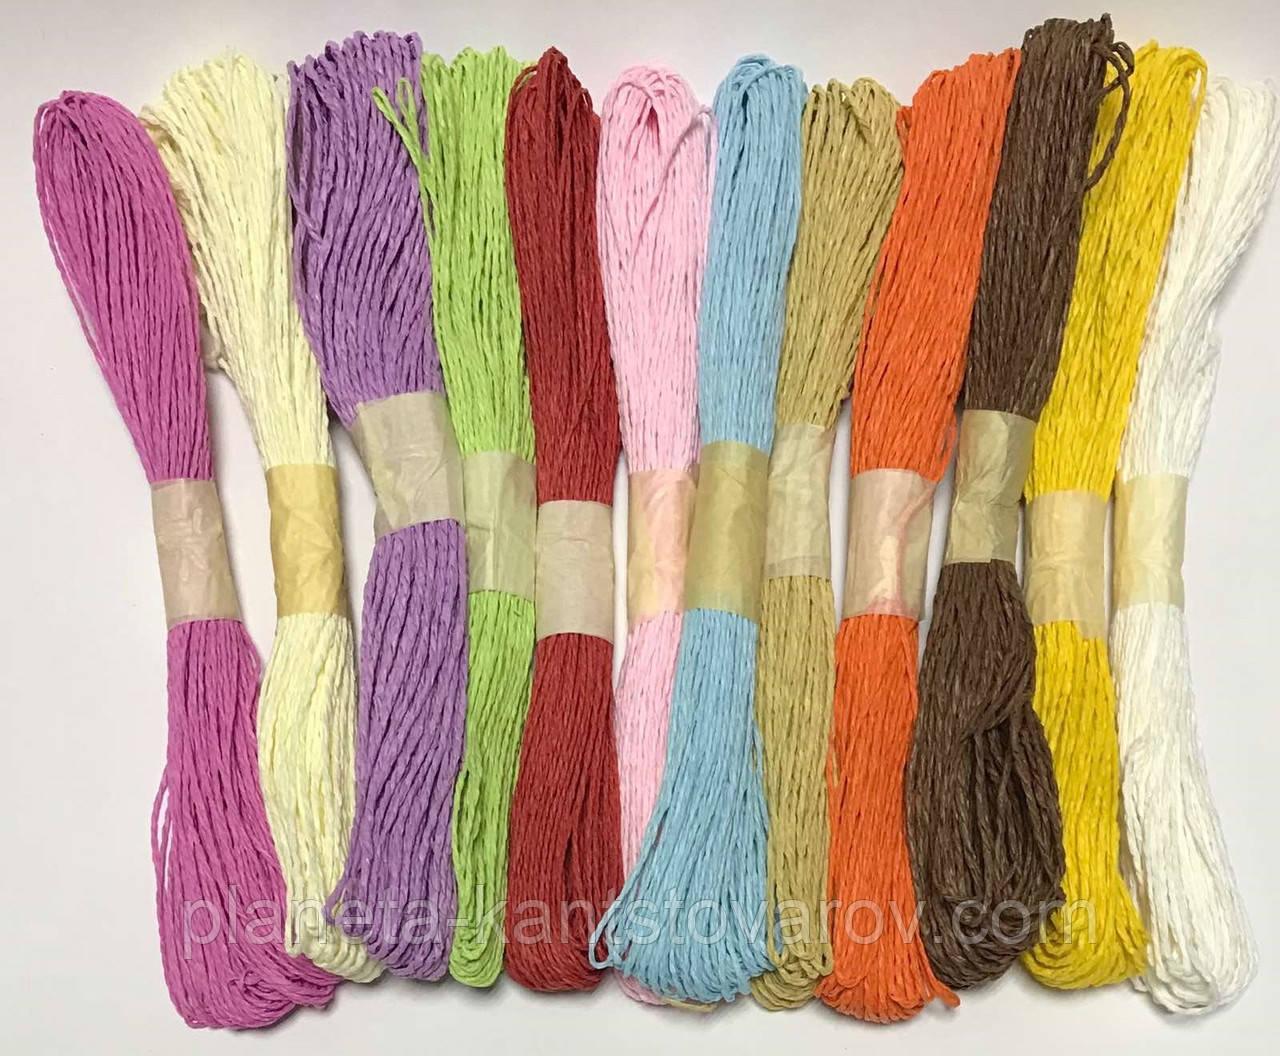 Шнуровка бумажная  12 цветов, 30 метров*12, D-1.5-2mm (цена за набор 12шт) 8174